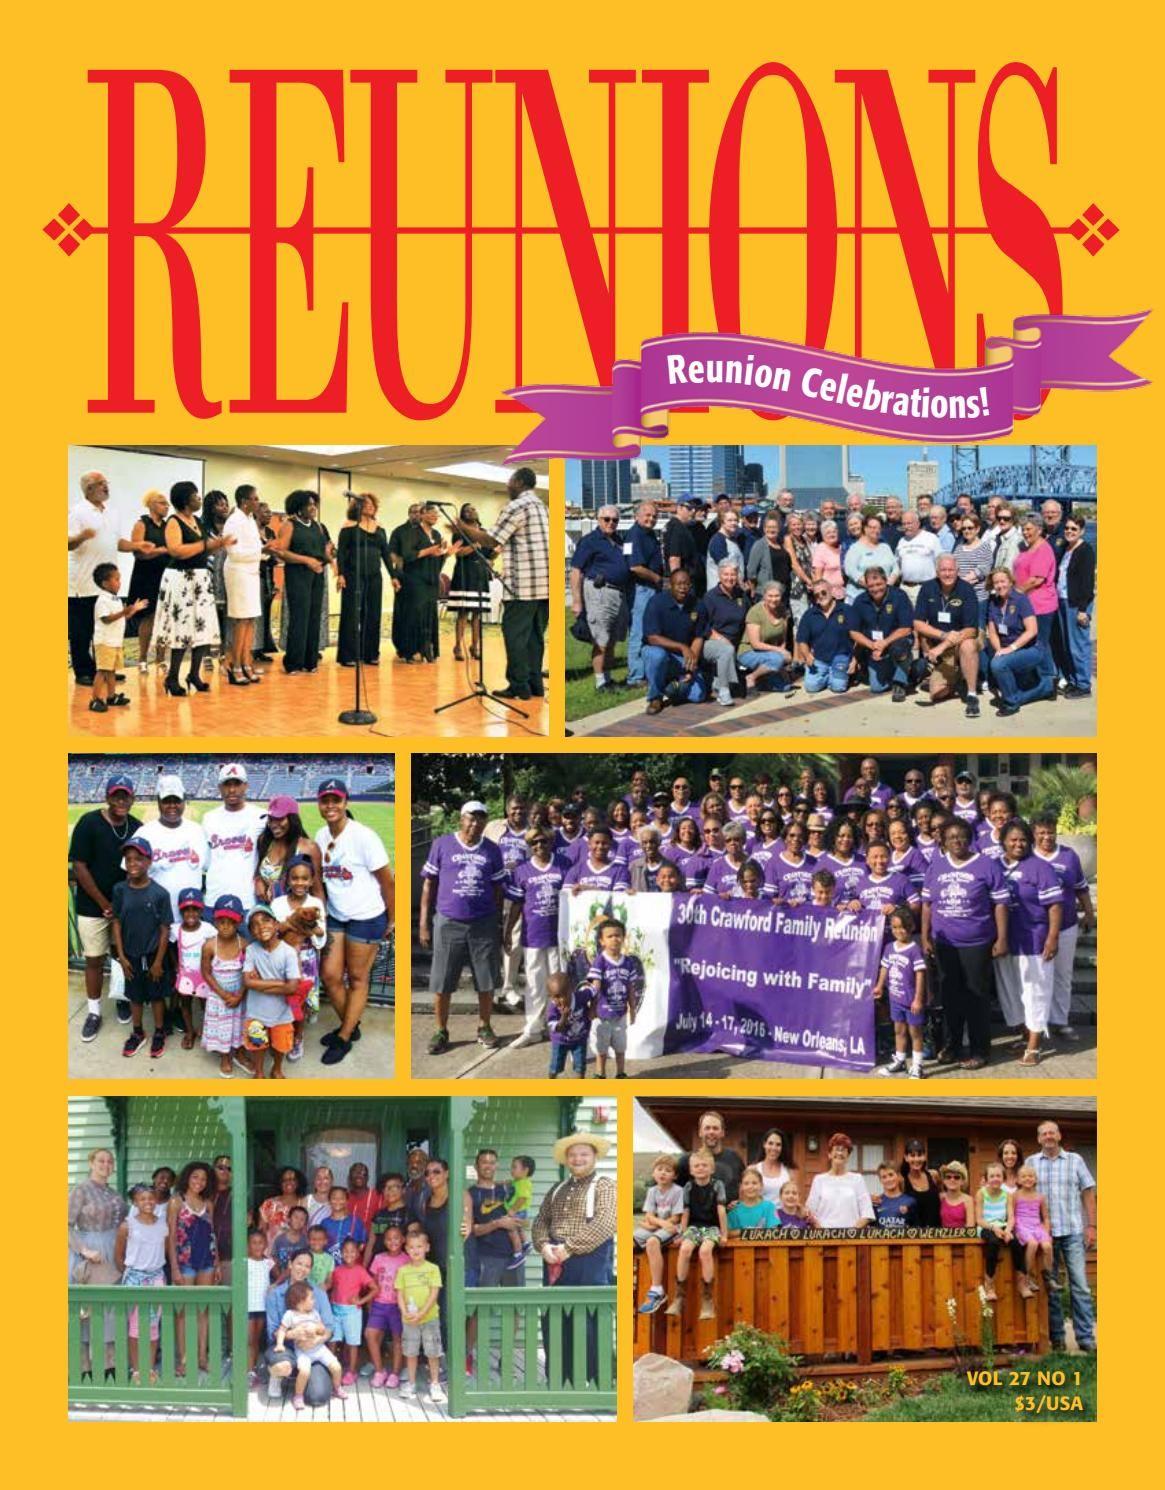 Reunions Magazine Volume 27 Number 1 February